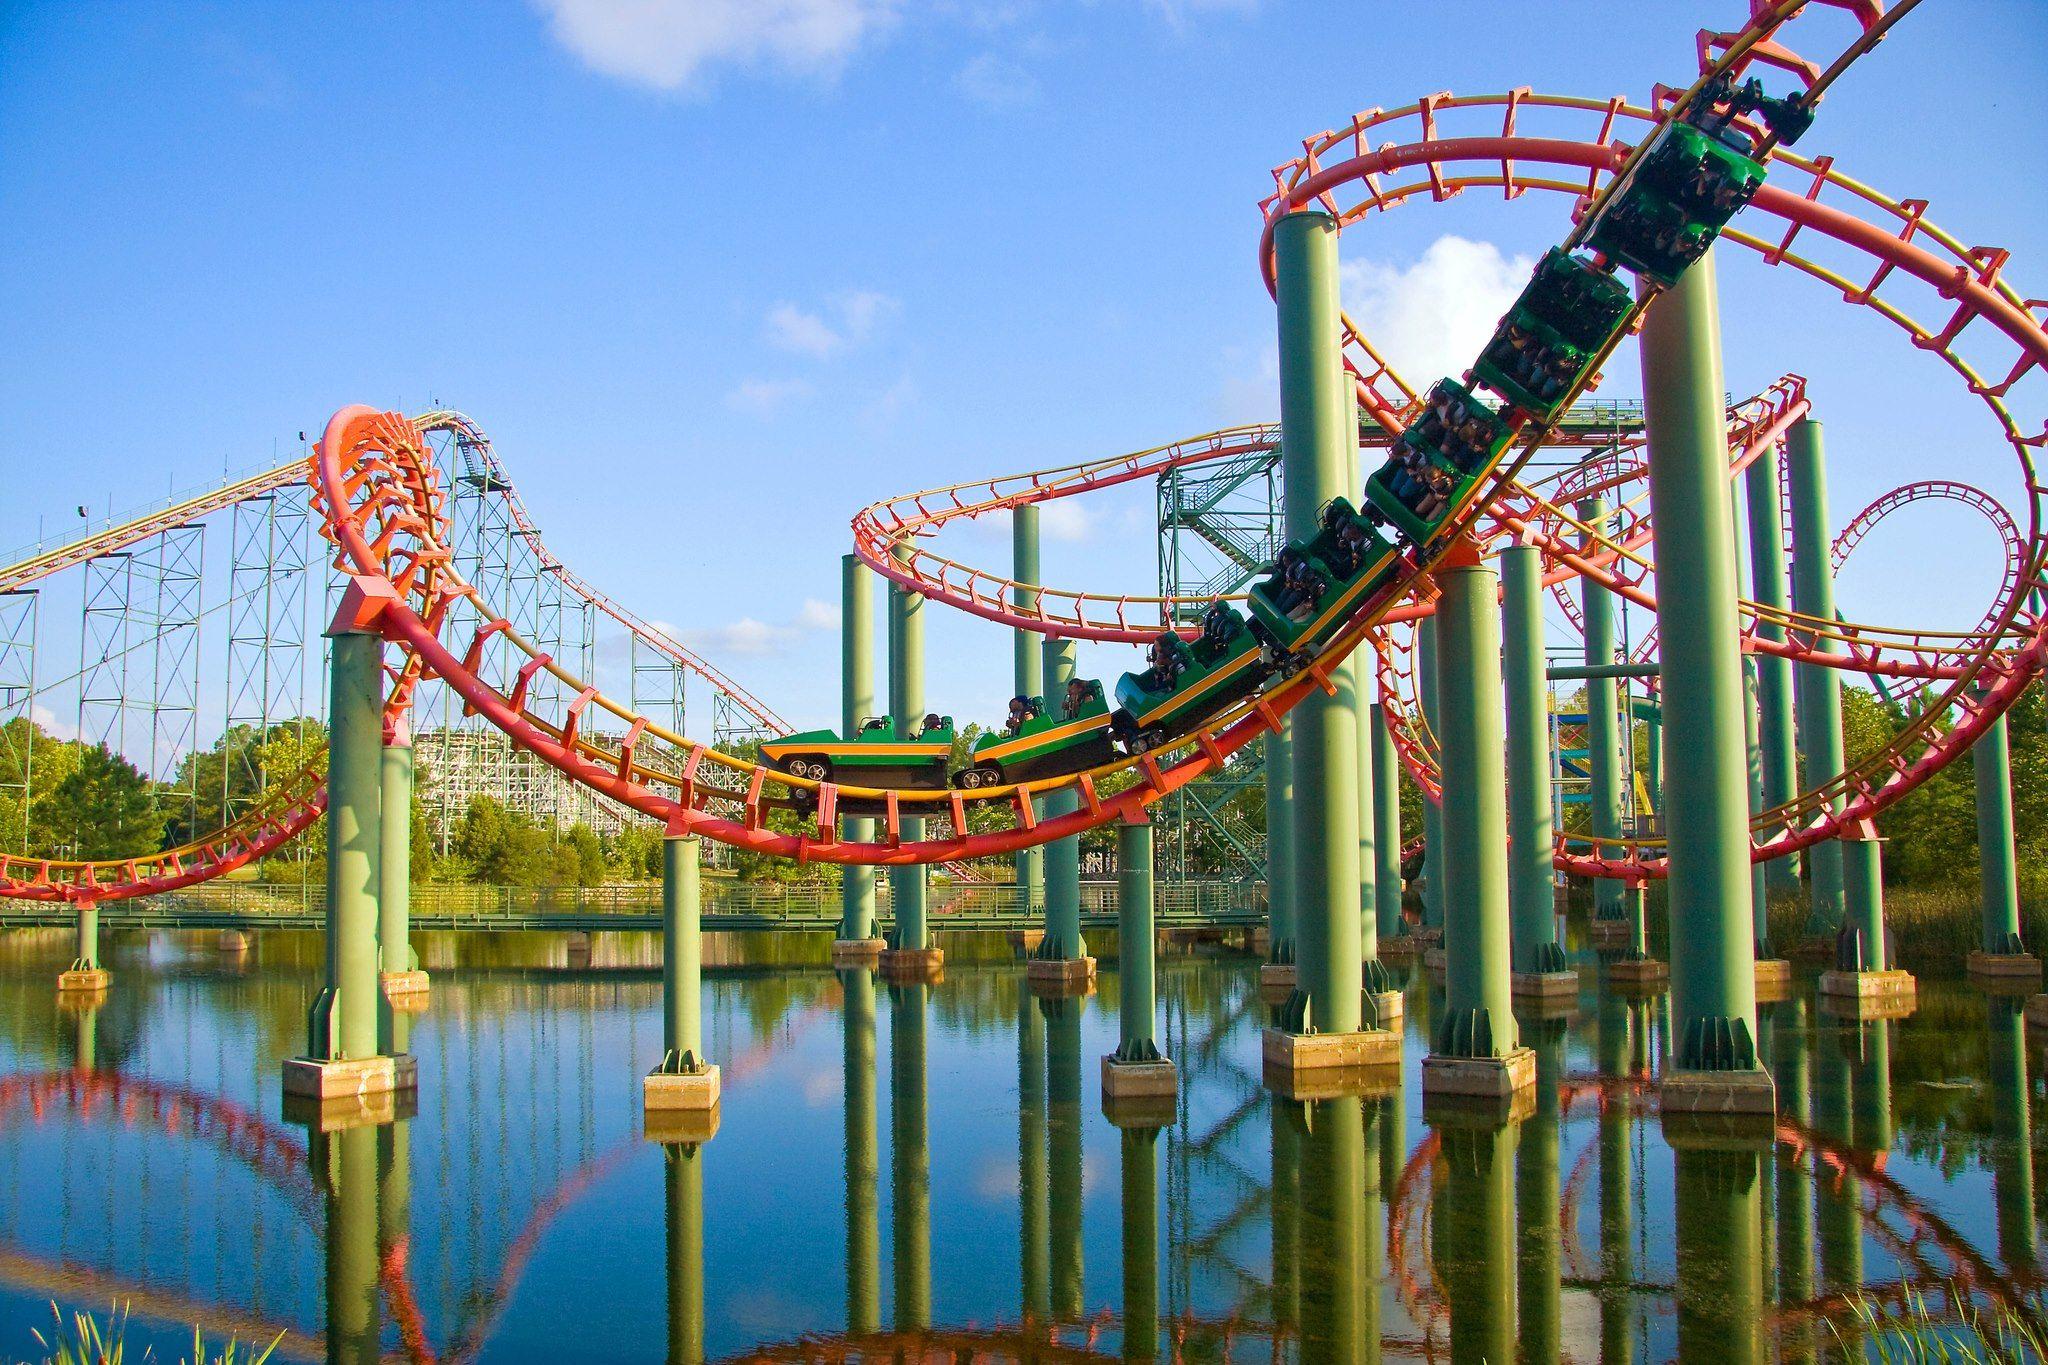 f1356c0c7a45da637b823562a1b1fd4d - Kings Dominion Vs Busch Gardens Va